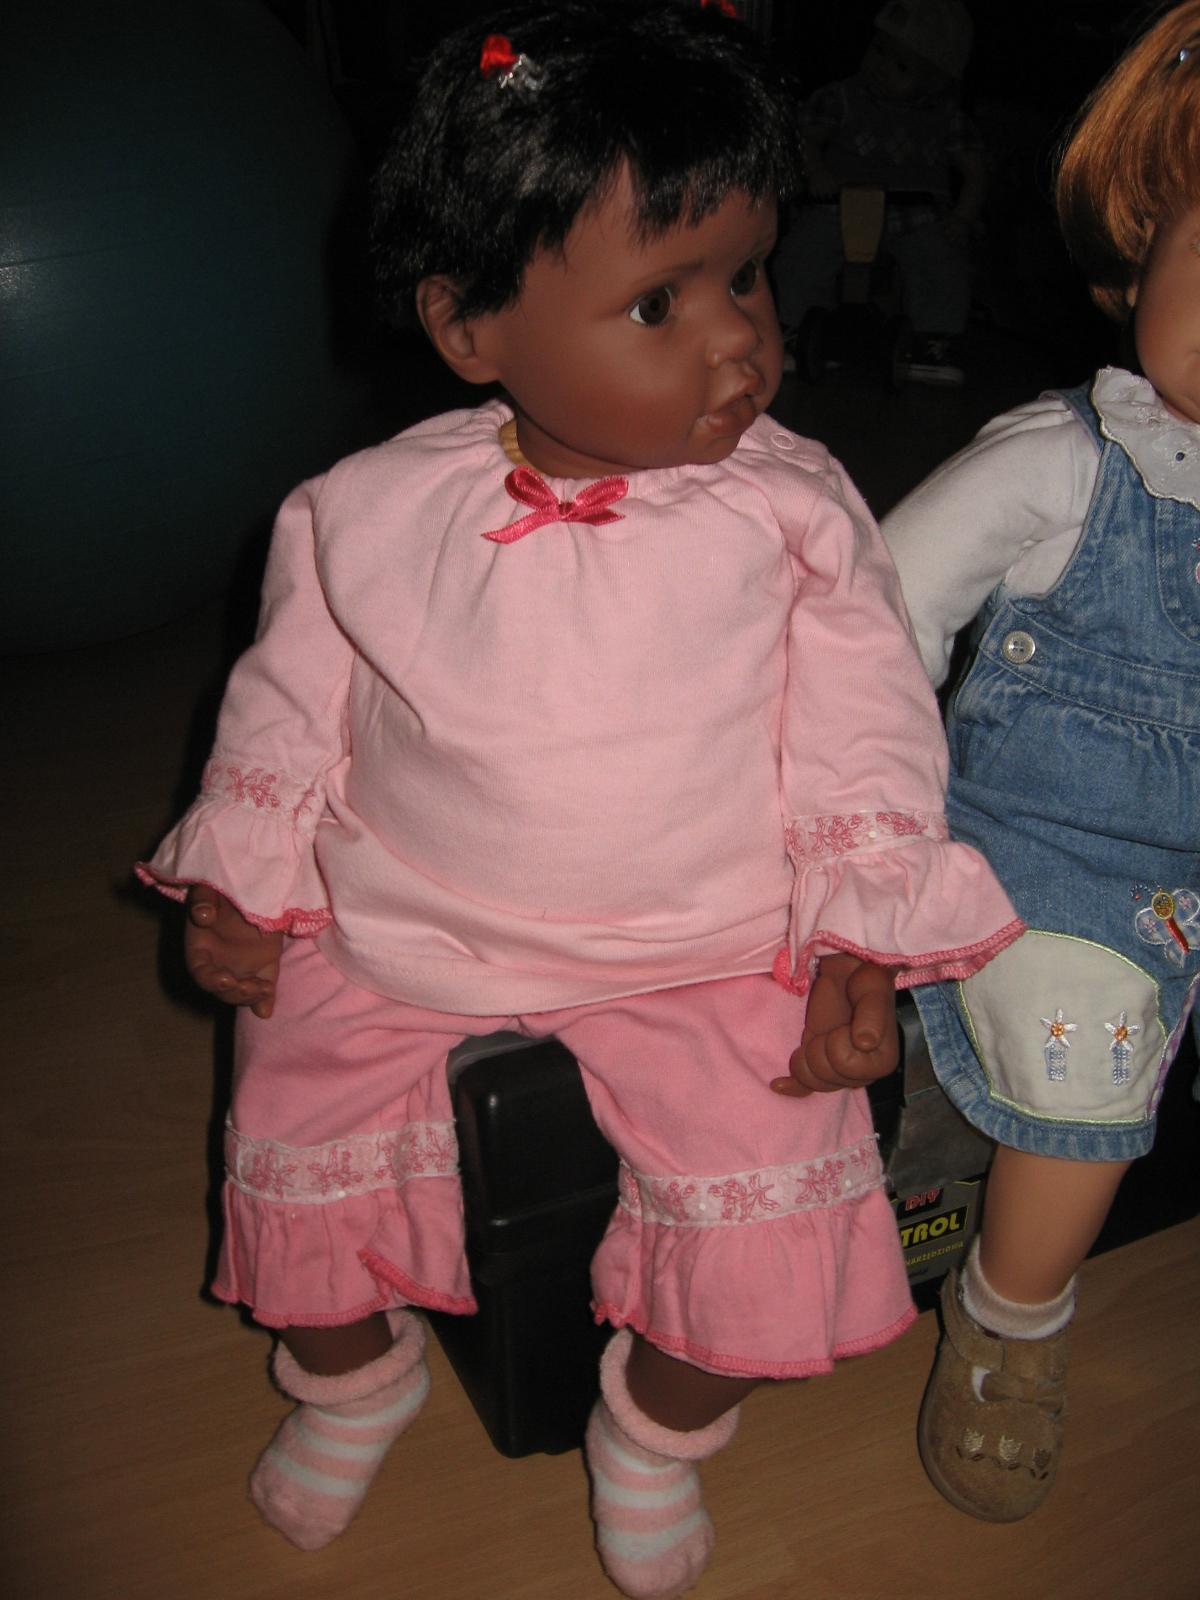 gotz kinderland doll  eBay